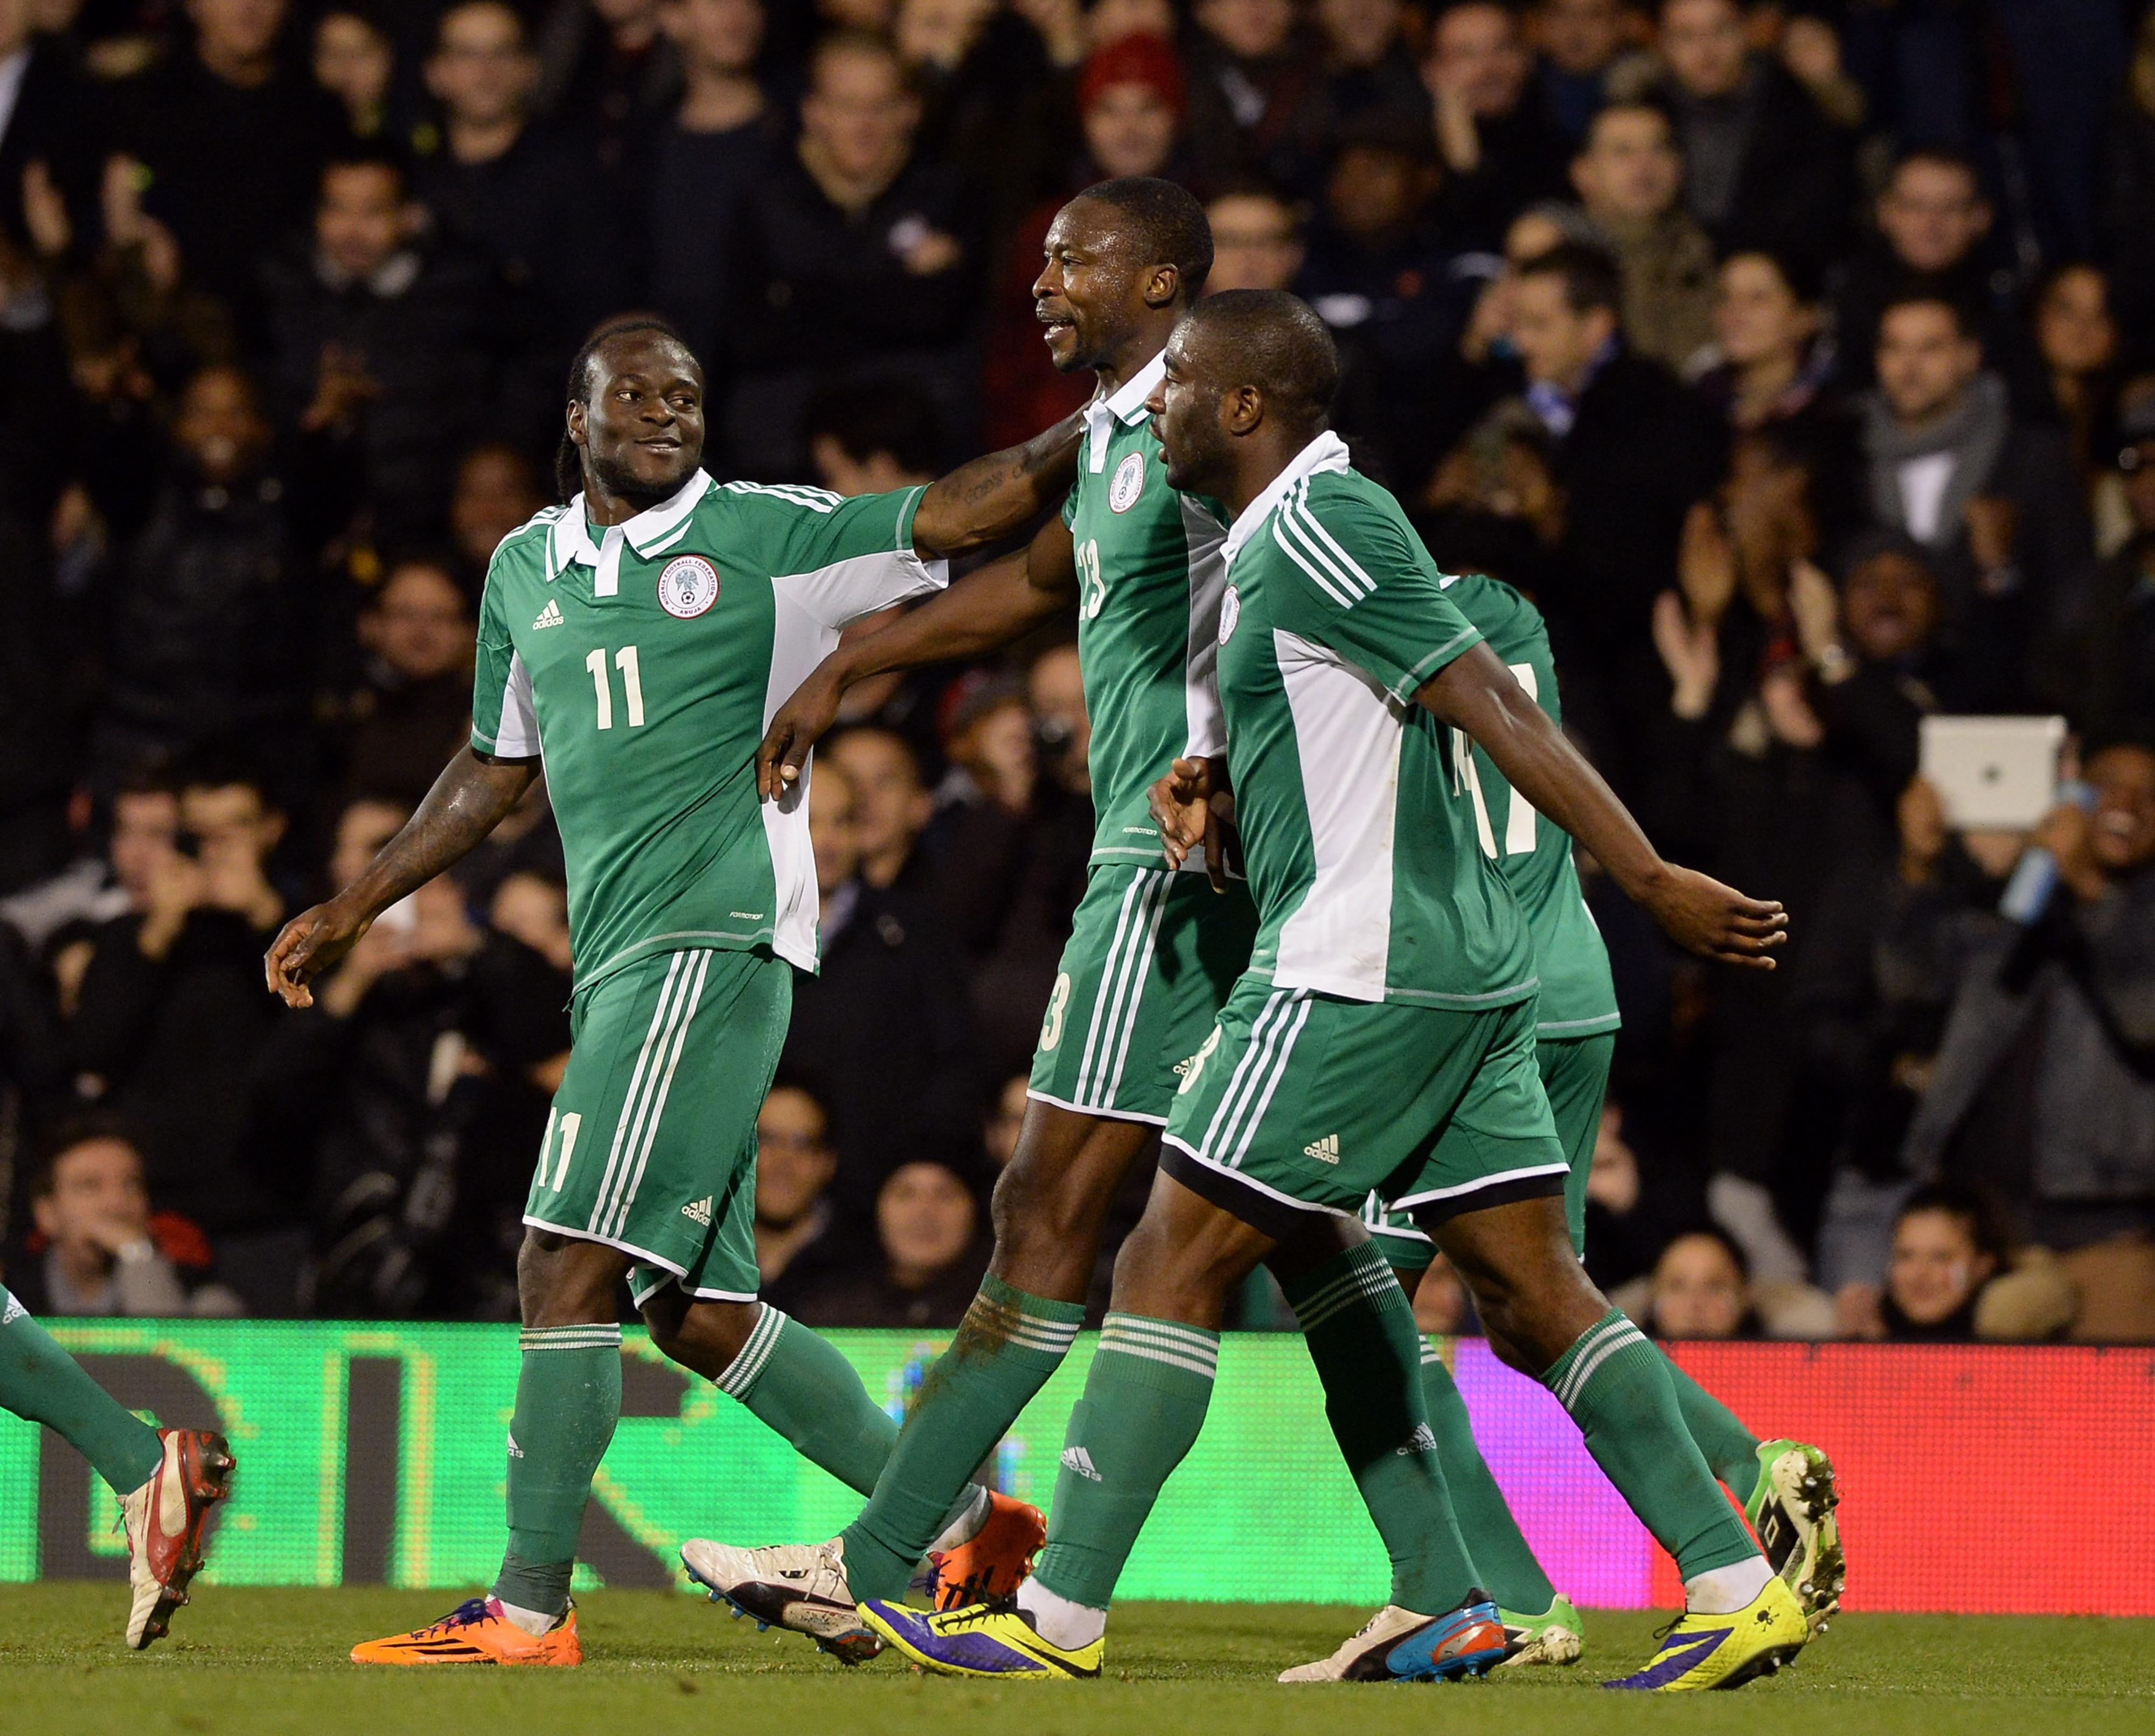 Shola Ameobi - international level goal scorer